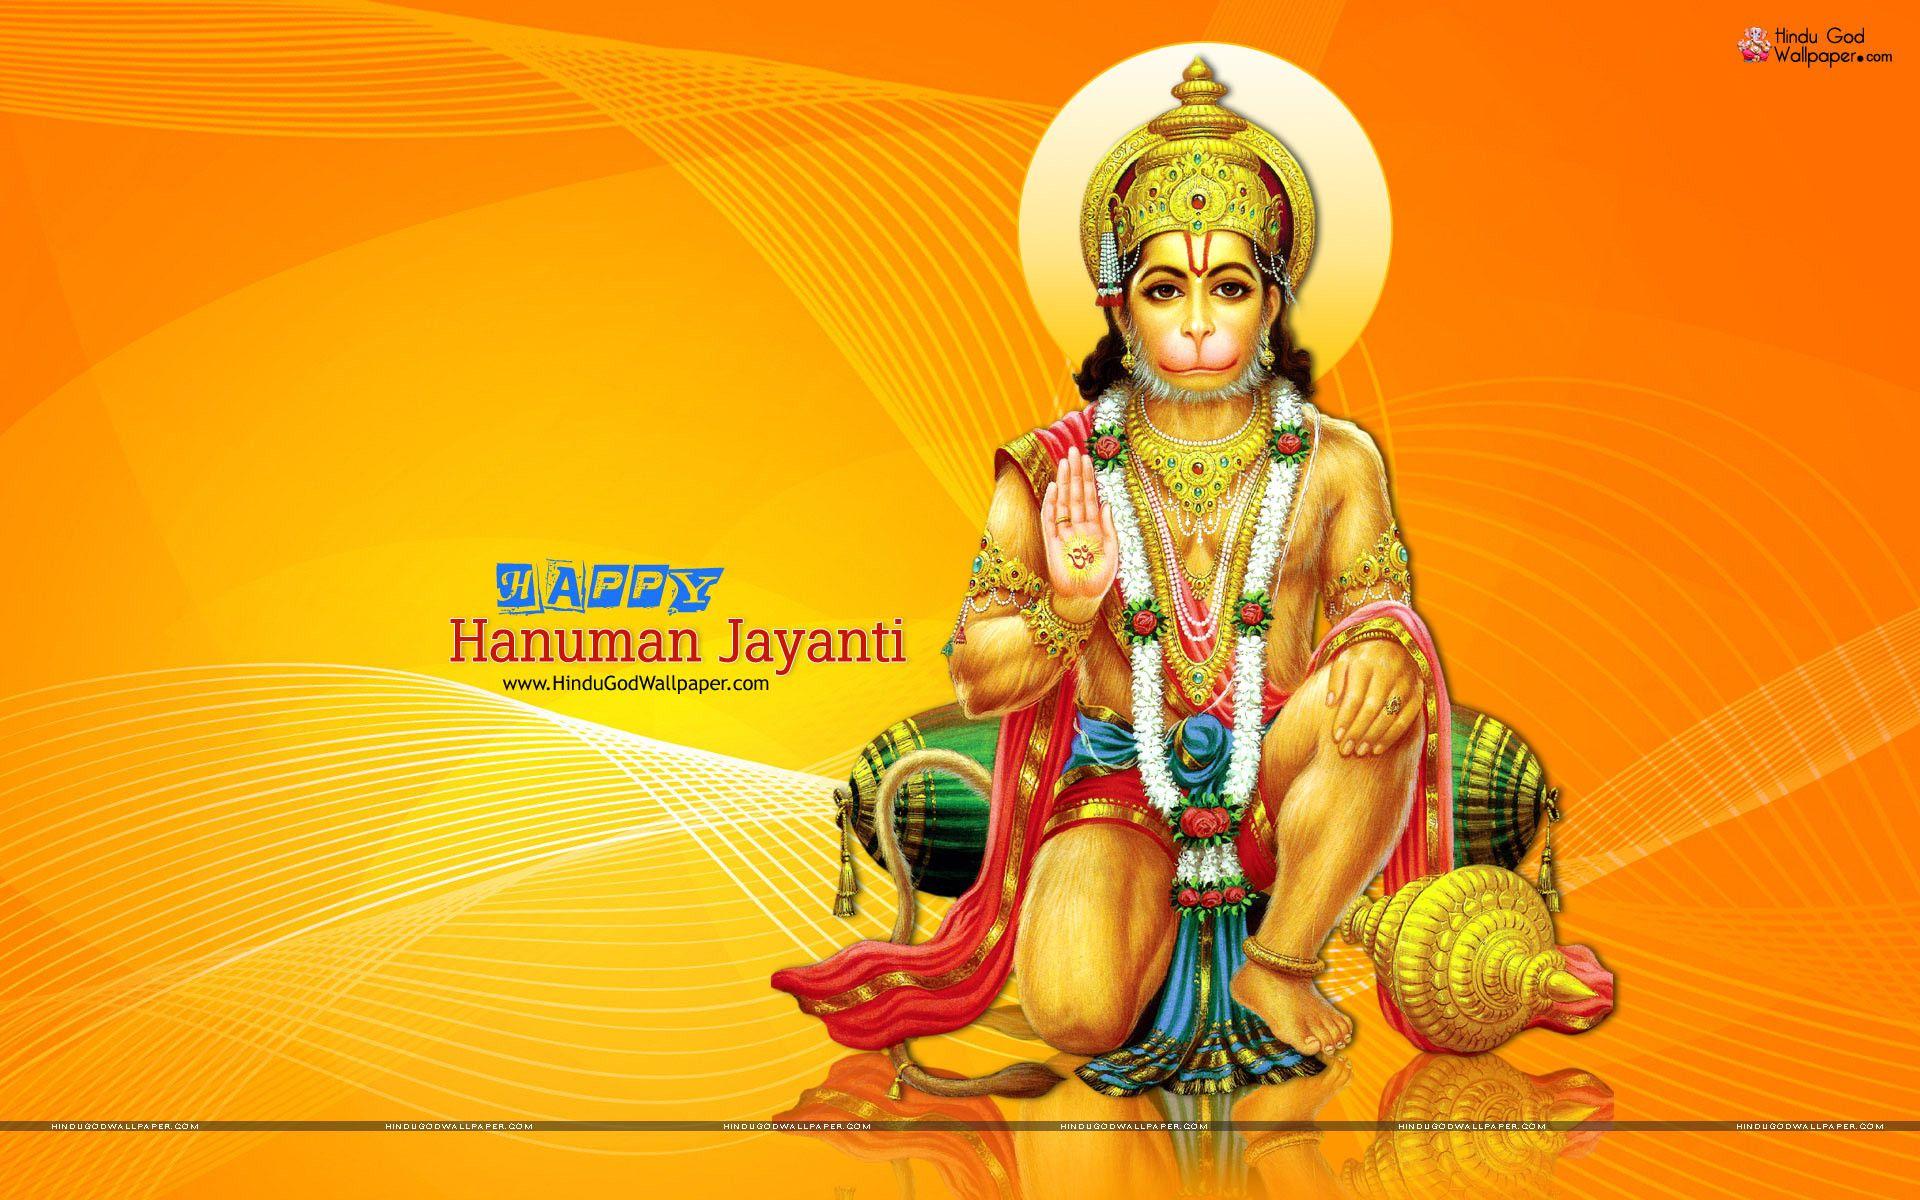 The Best Beautiful Hindu God Hd Wallpapers 1366X768